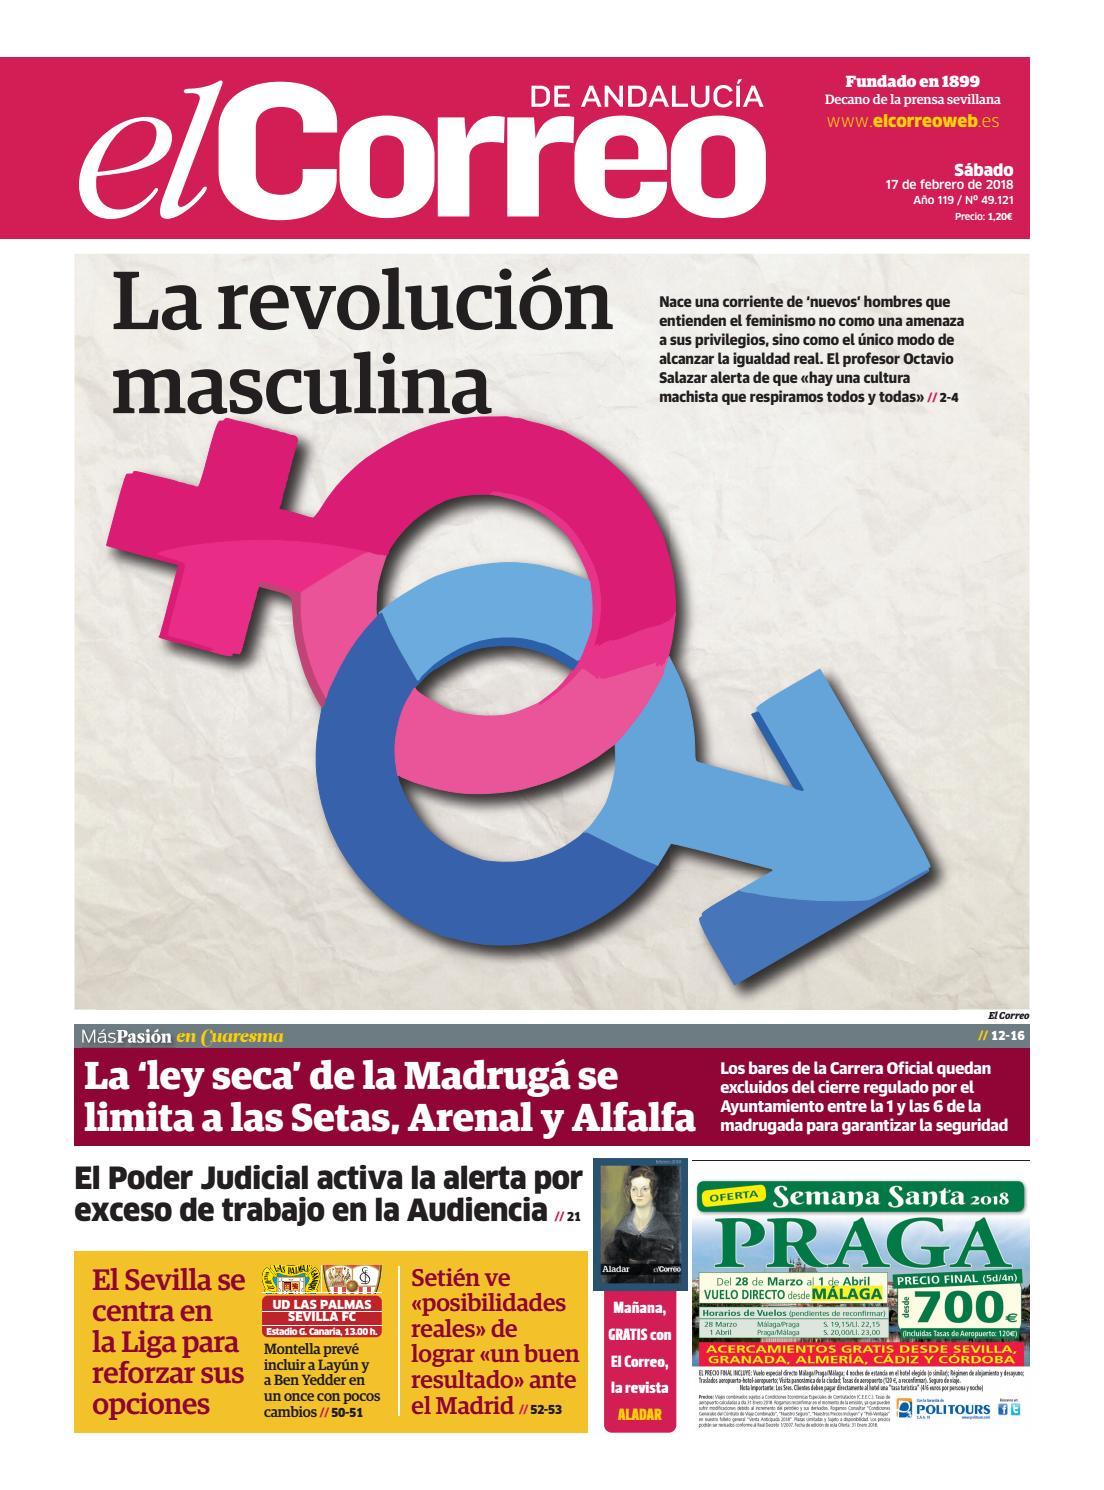 17.02.2018 El Correo de Andalucía by EL CORREO DE ANDALUCÍA S.L. - issuu 481f28a1046